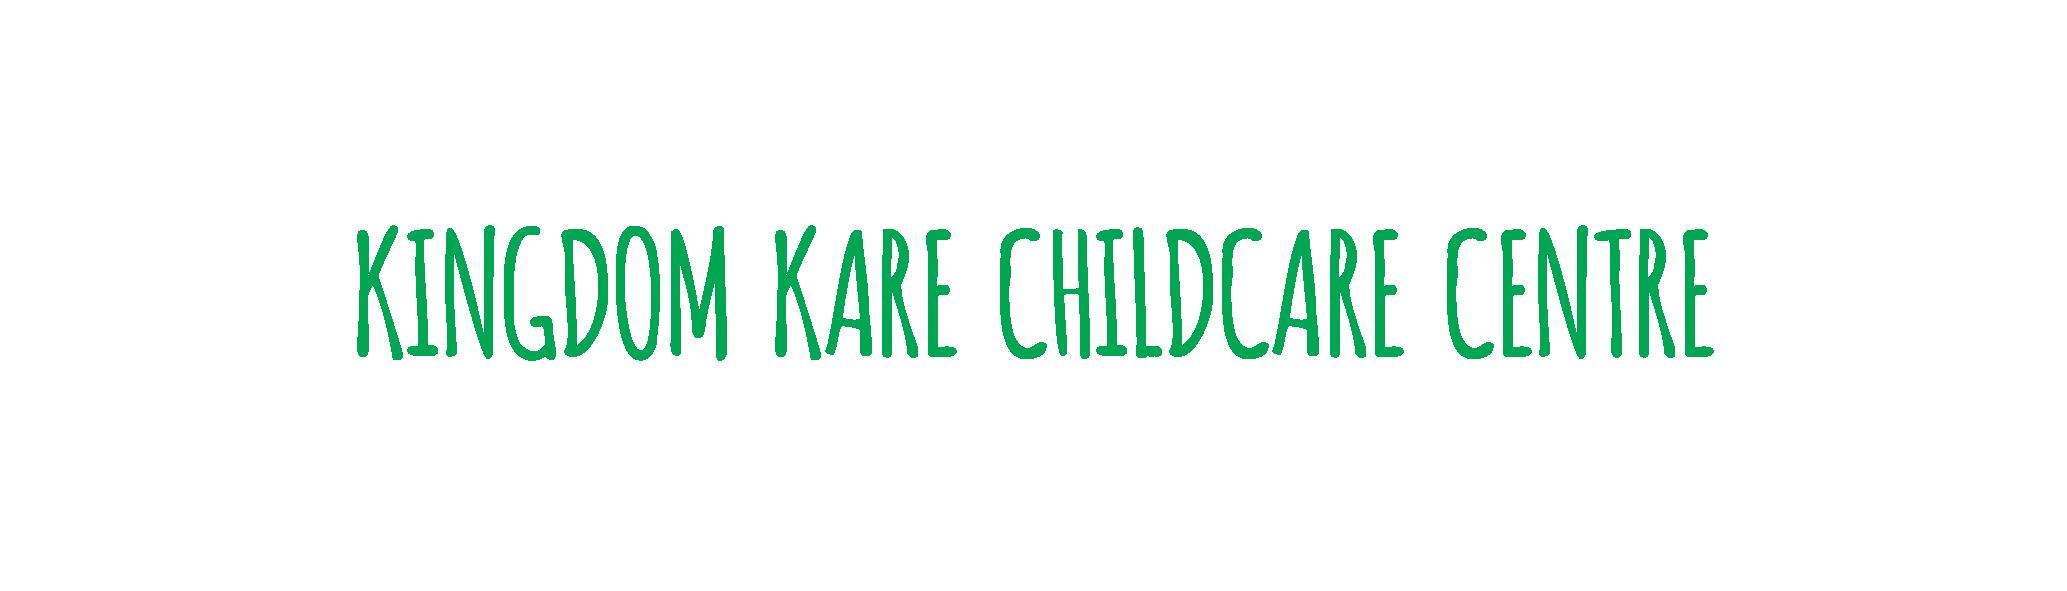 Kingdom-Kare-Childcare-Centre-Rotating-Header2.png